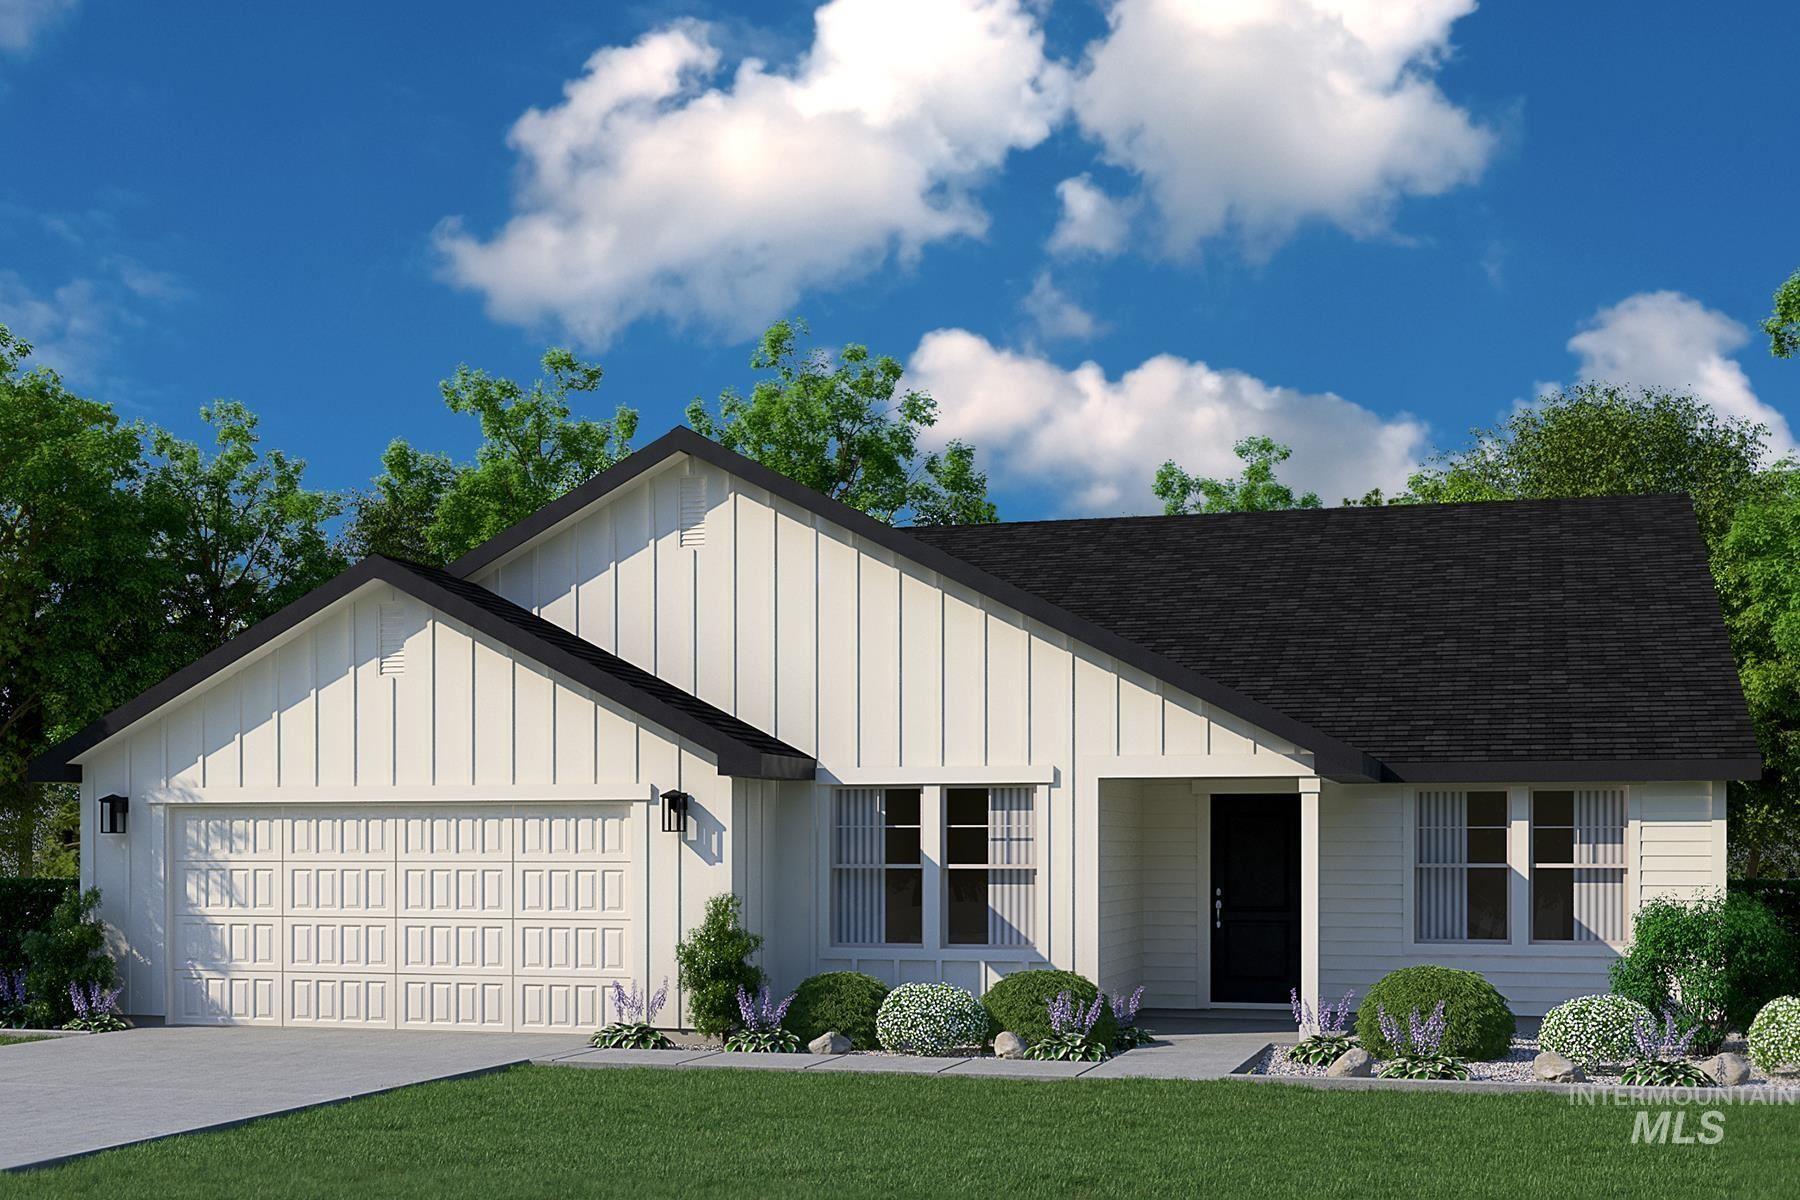 3828 S Pelican Ridge Ave., Nampa, ID 83687 - MLS#: 98810104